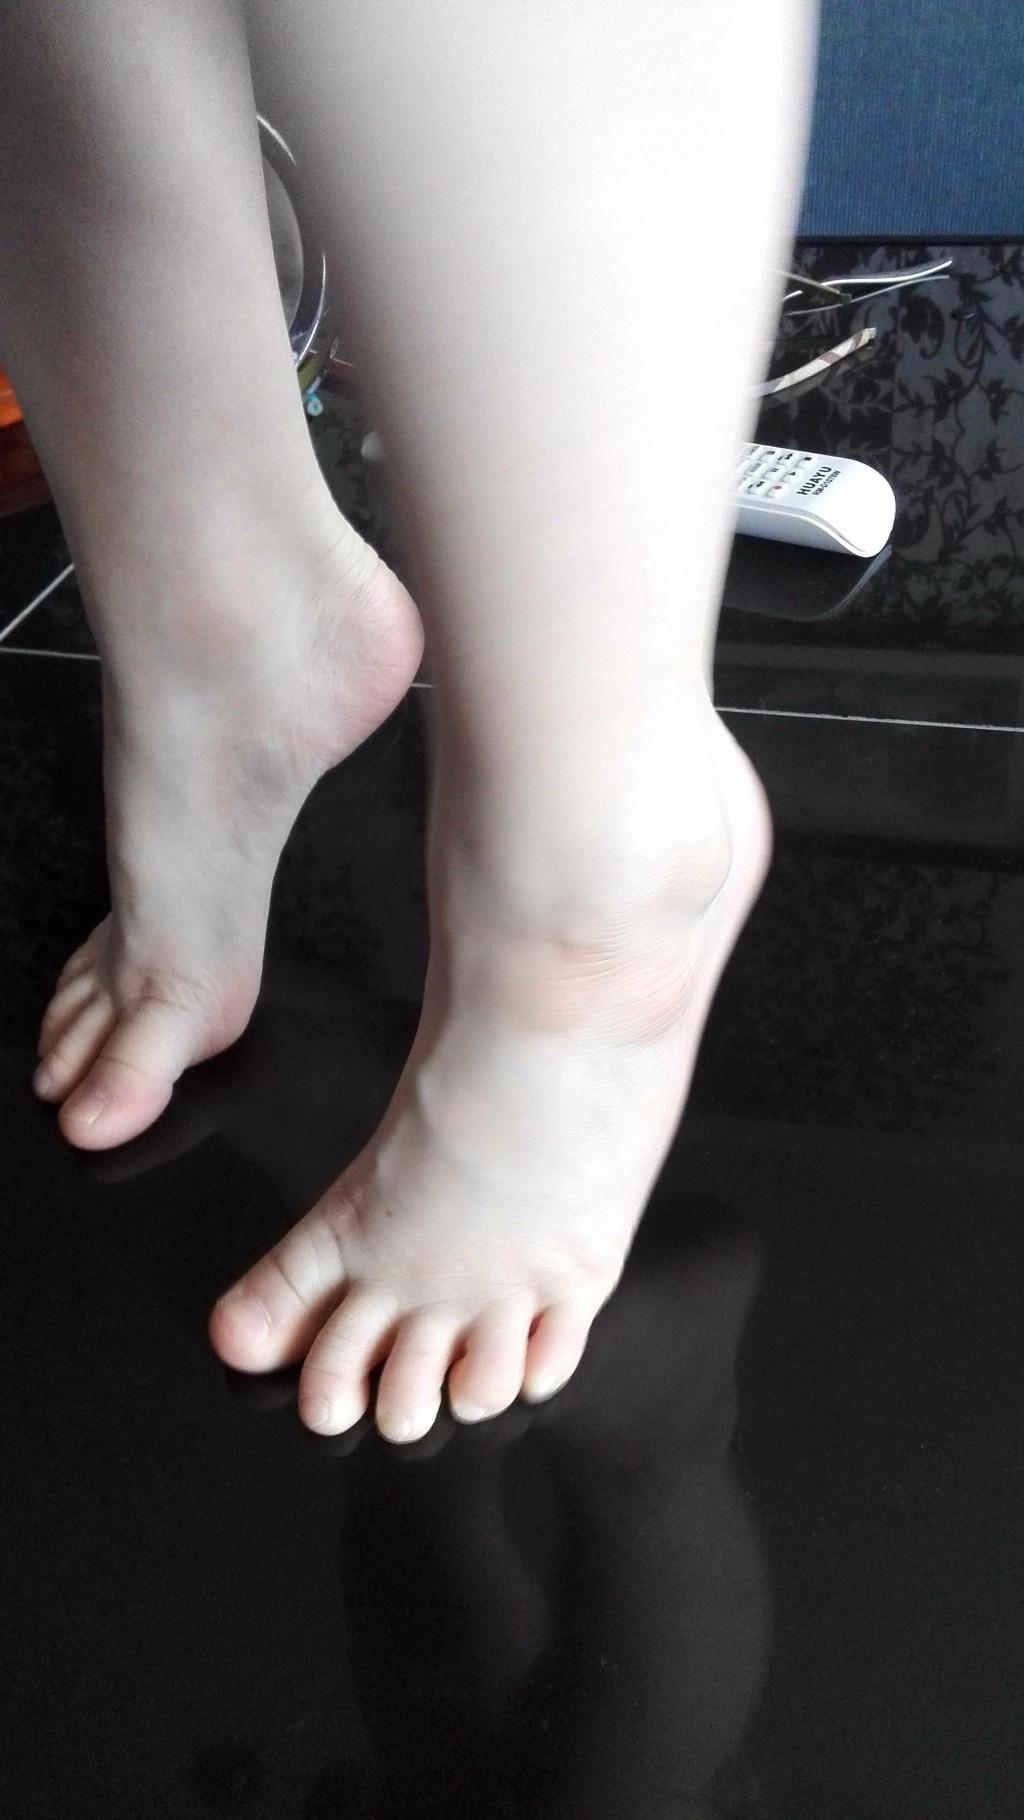 Шишки на ногах у детей фото